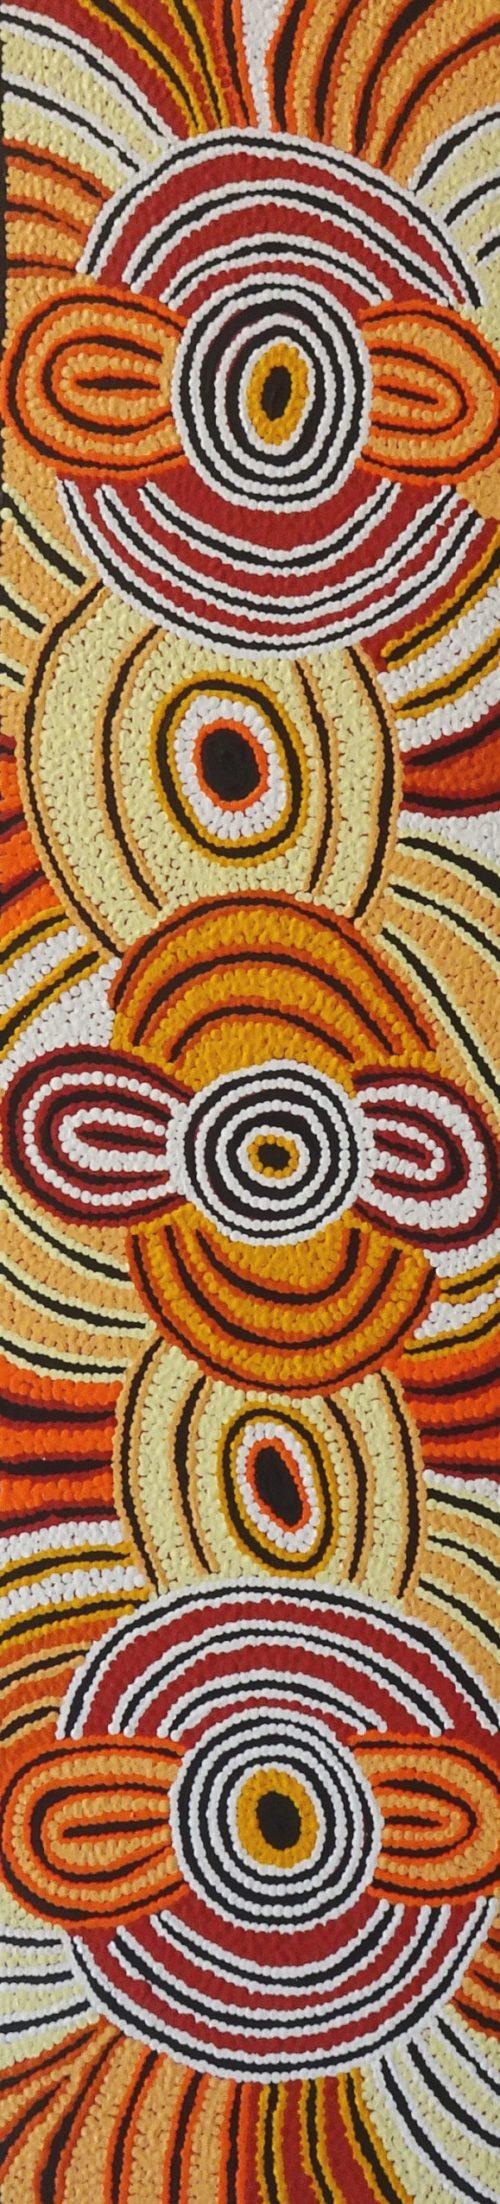 Kim Butler Napurrula Aboriginal Art